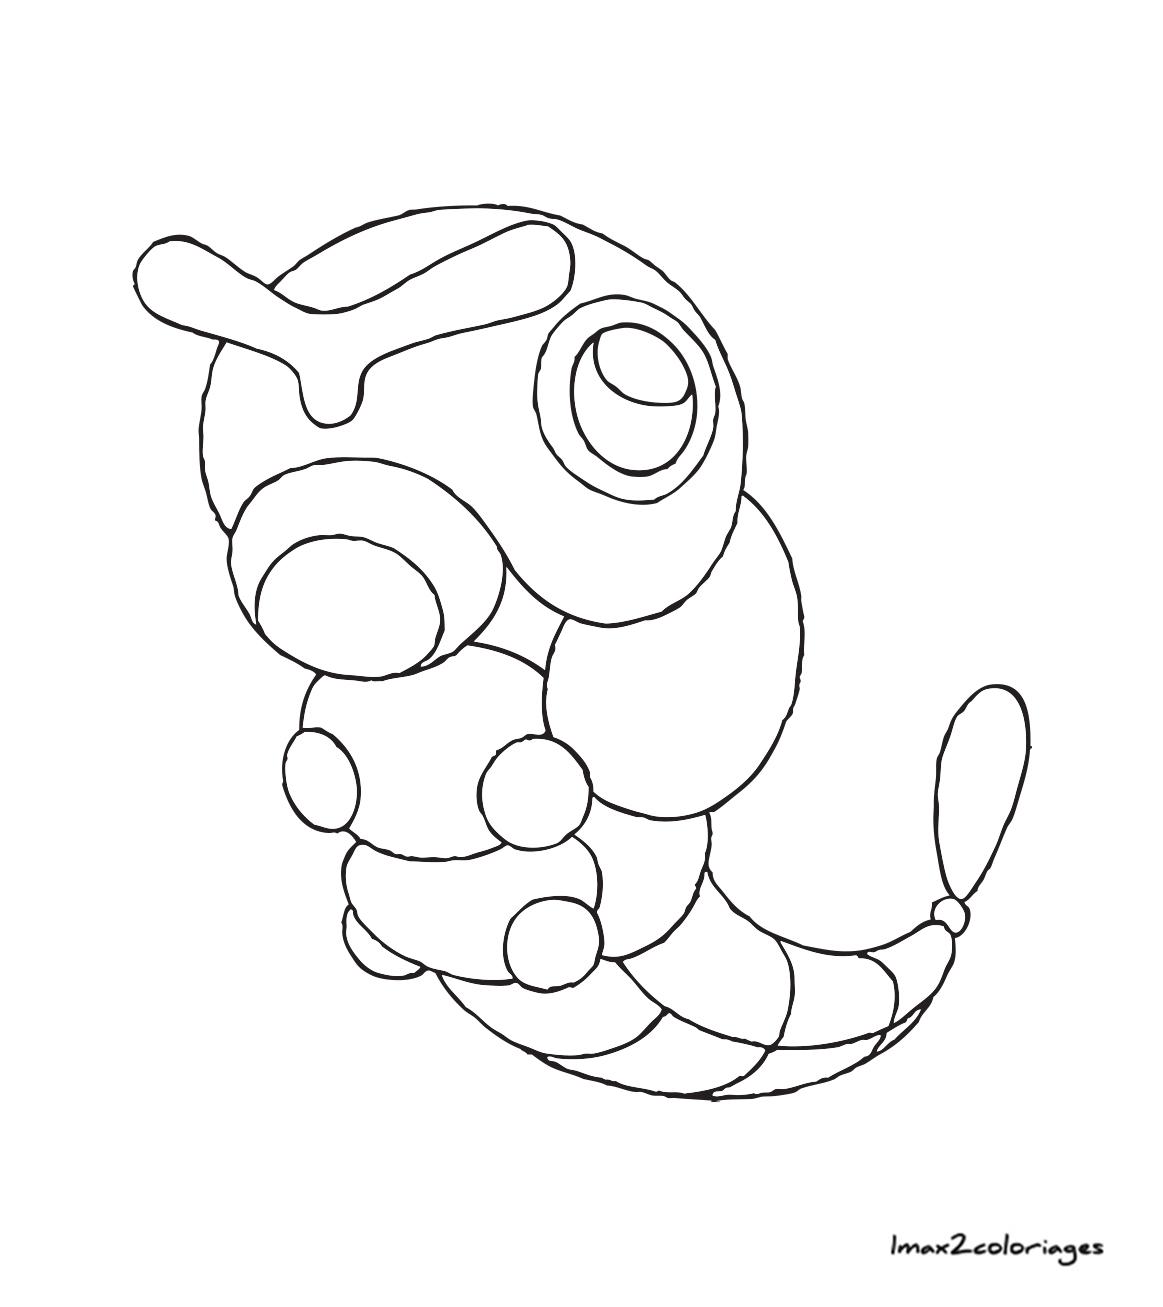 Coloriages pokemon chenipan - Coloriages pokemon ...